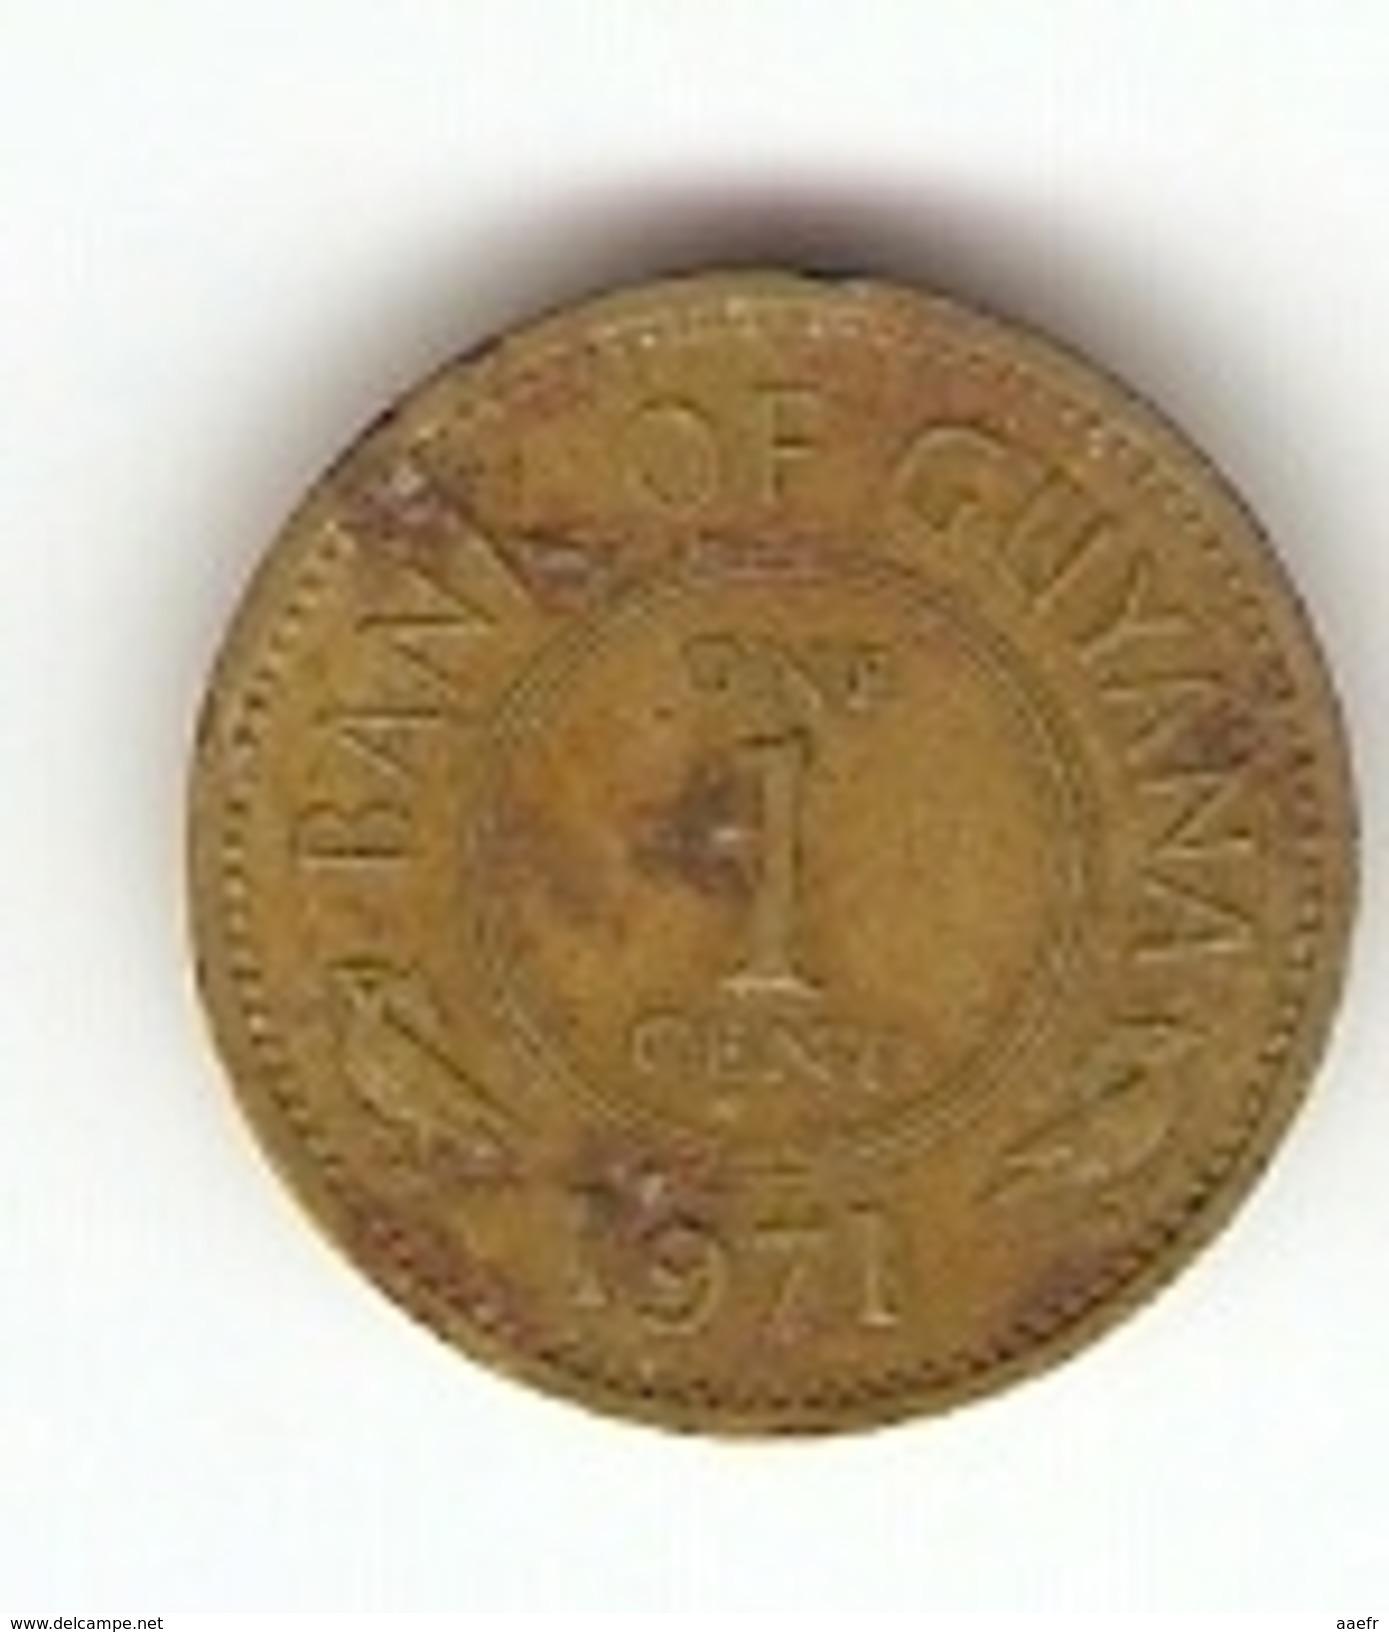 Monnaie - Guyana - 1 Cent - 1971 - Guyana